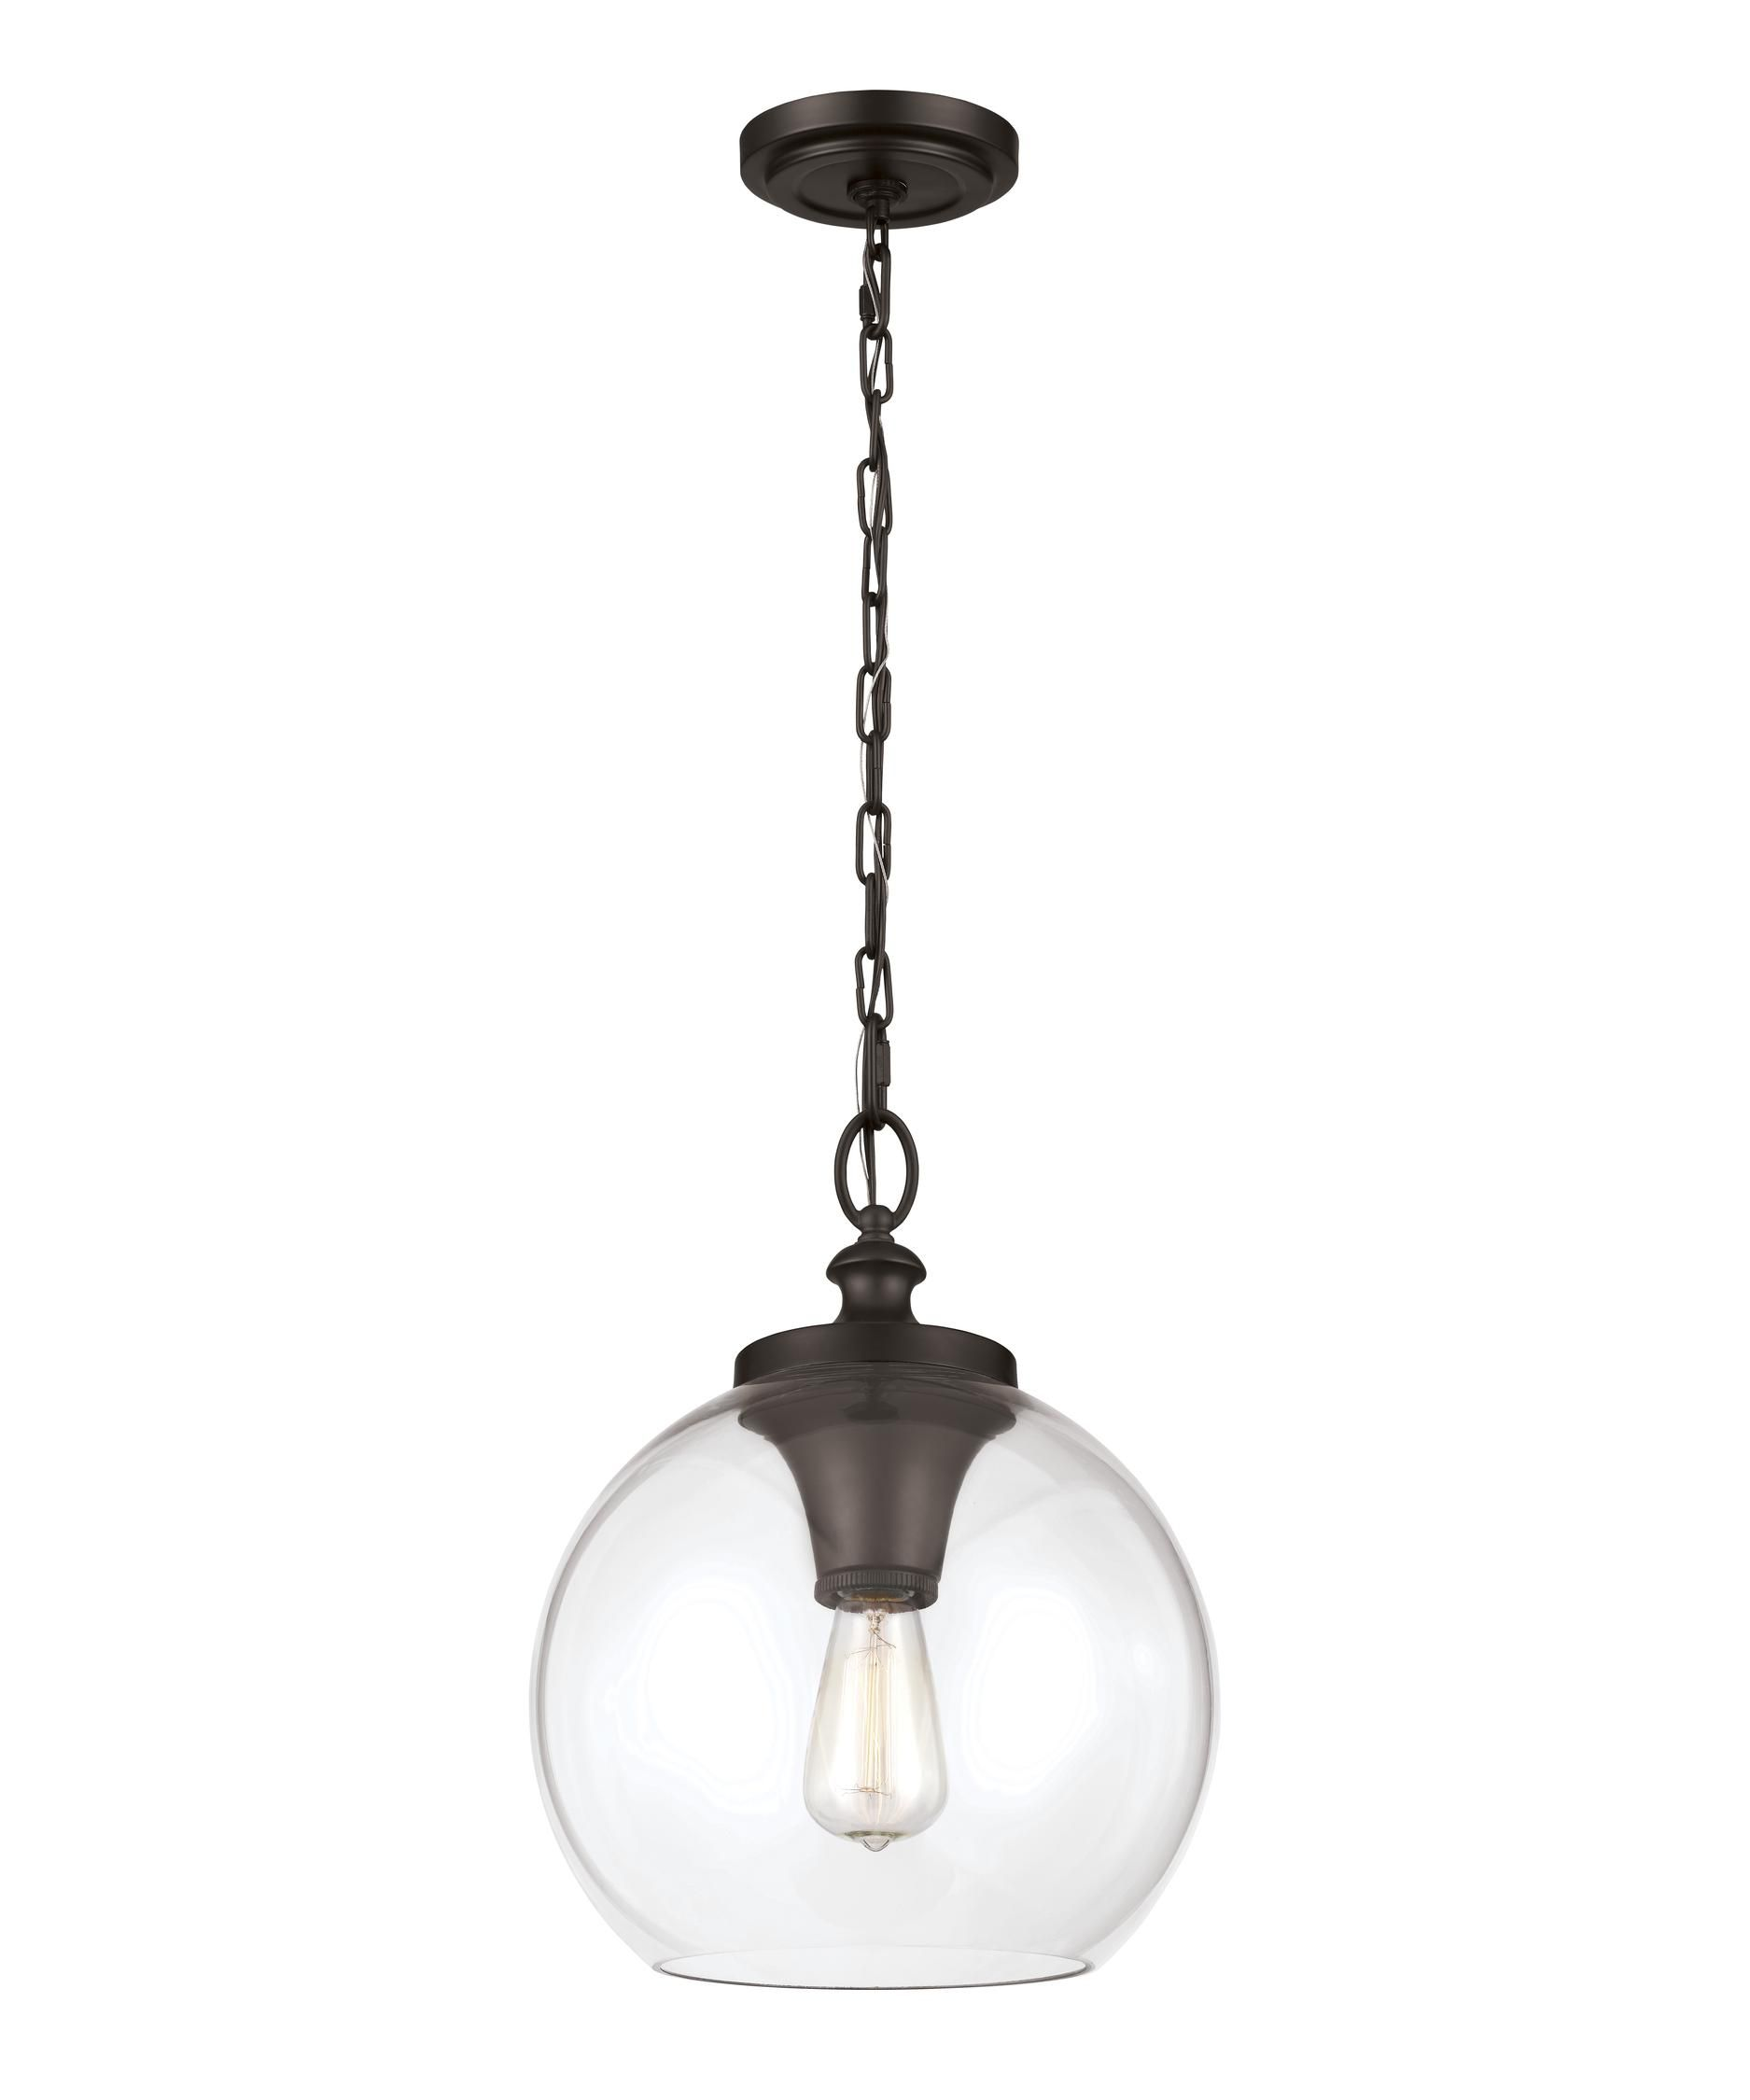 Murray feiss tabby 12 inch wide 1 light large pendant pendants 12 193 murray feiss p1307orb tabby large pendant capitol lighting 1800lighting aloadofball Gallery